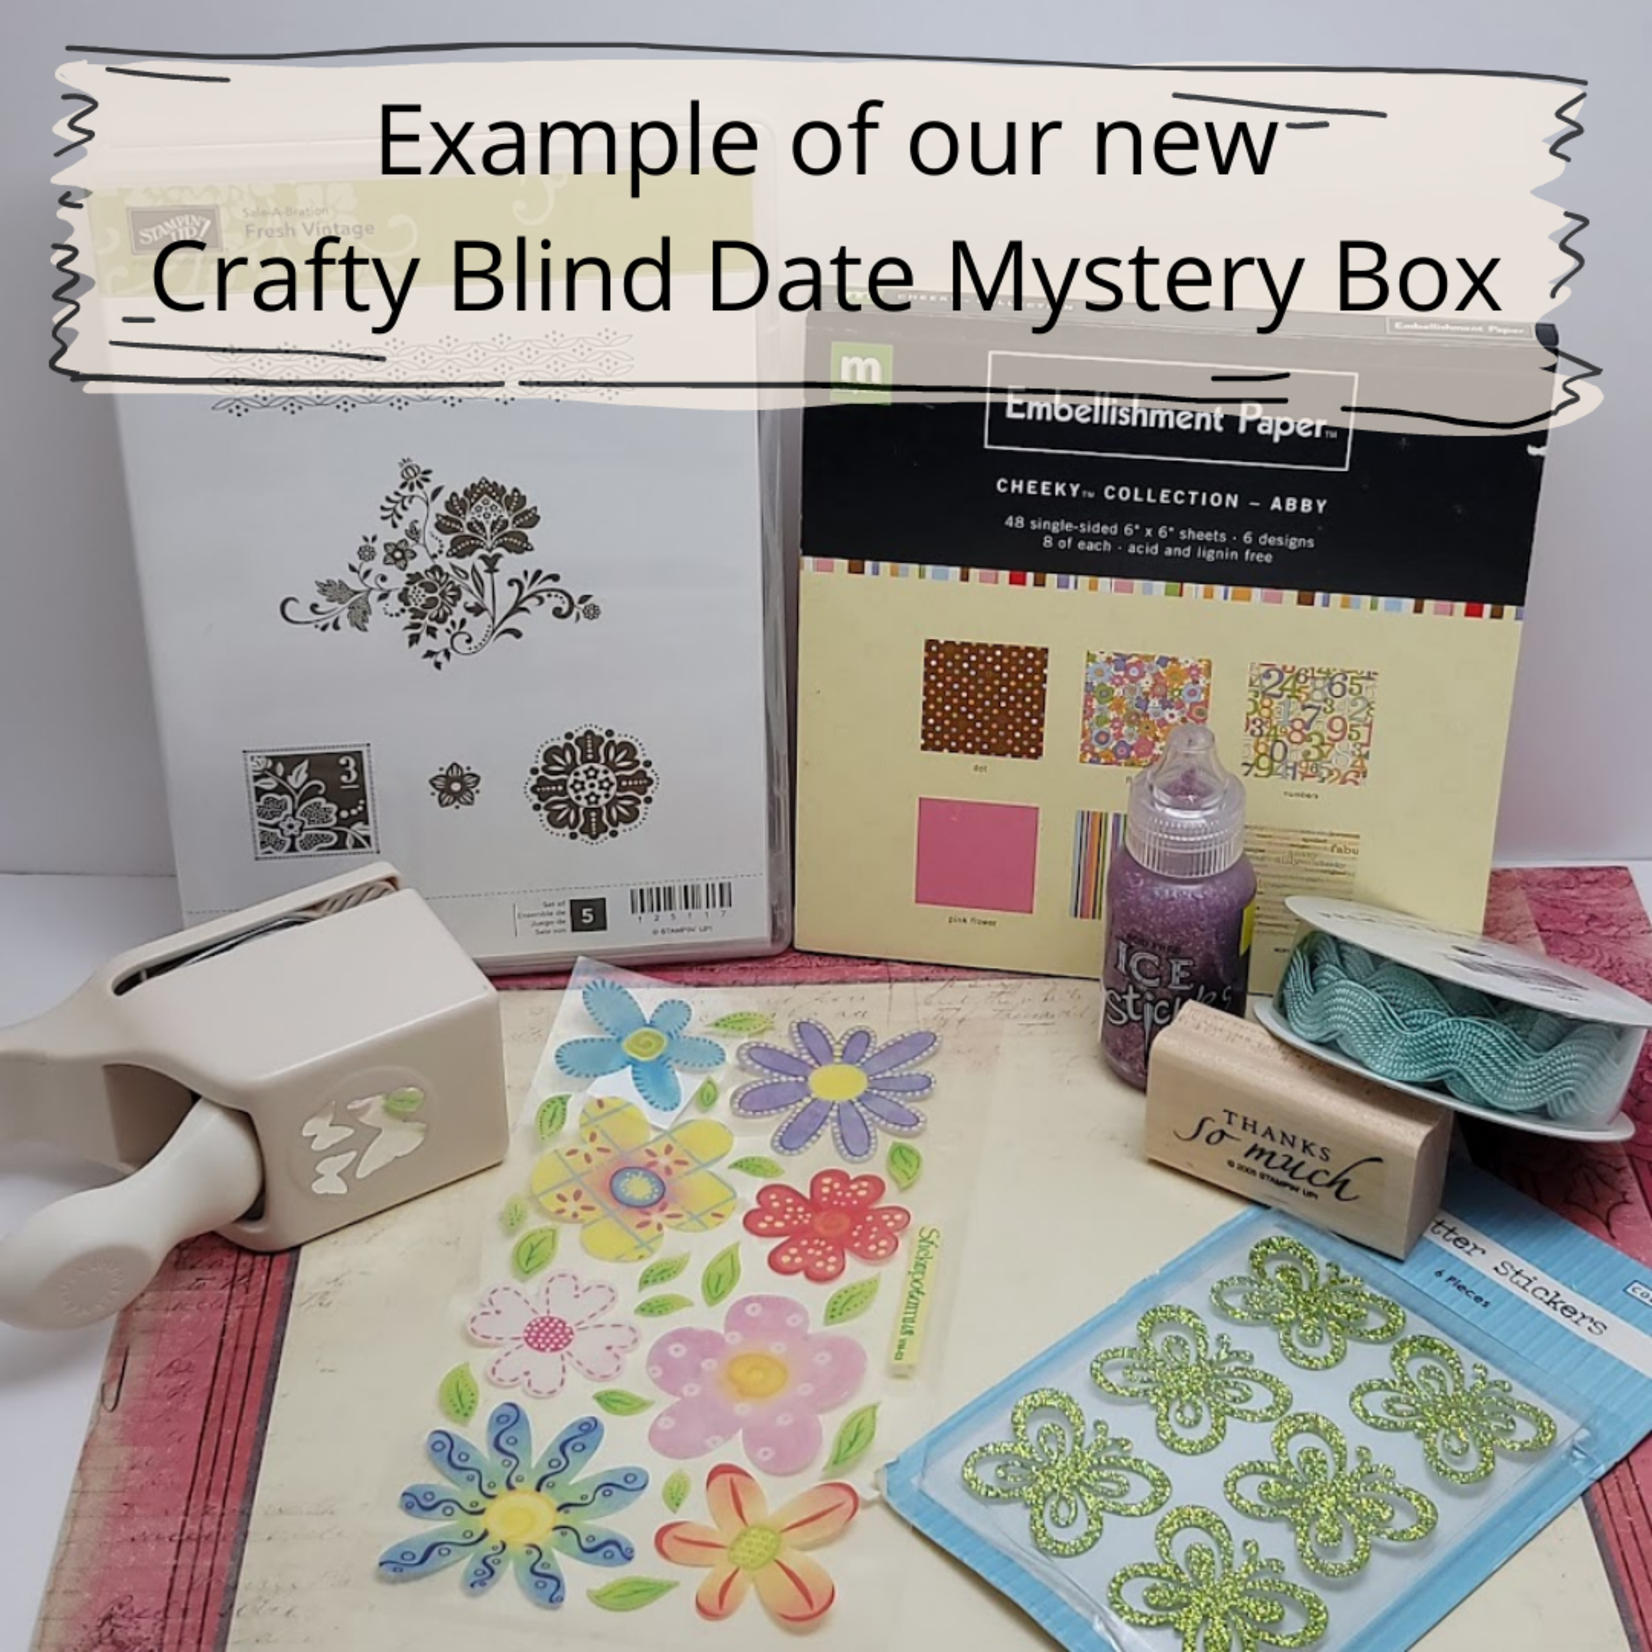 Crafty Blind Date Mystery Box